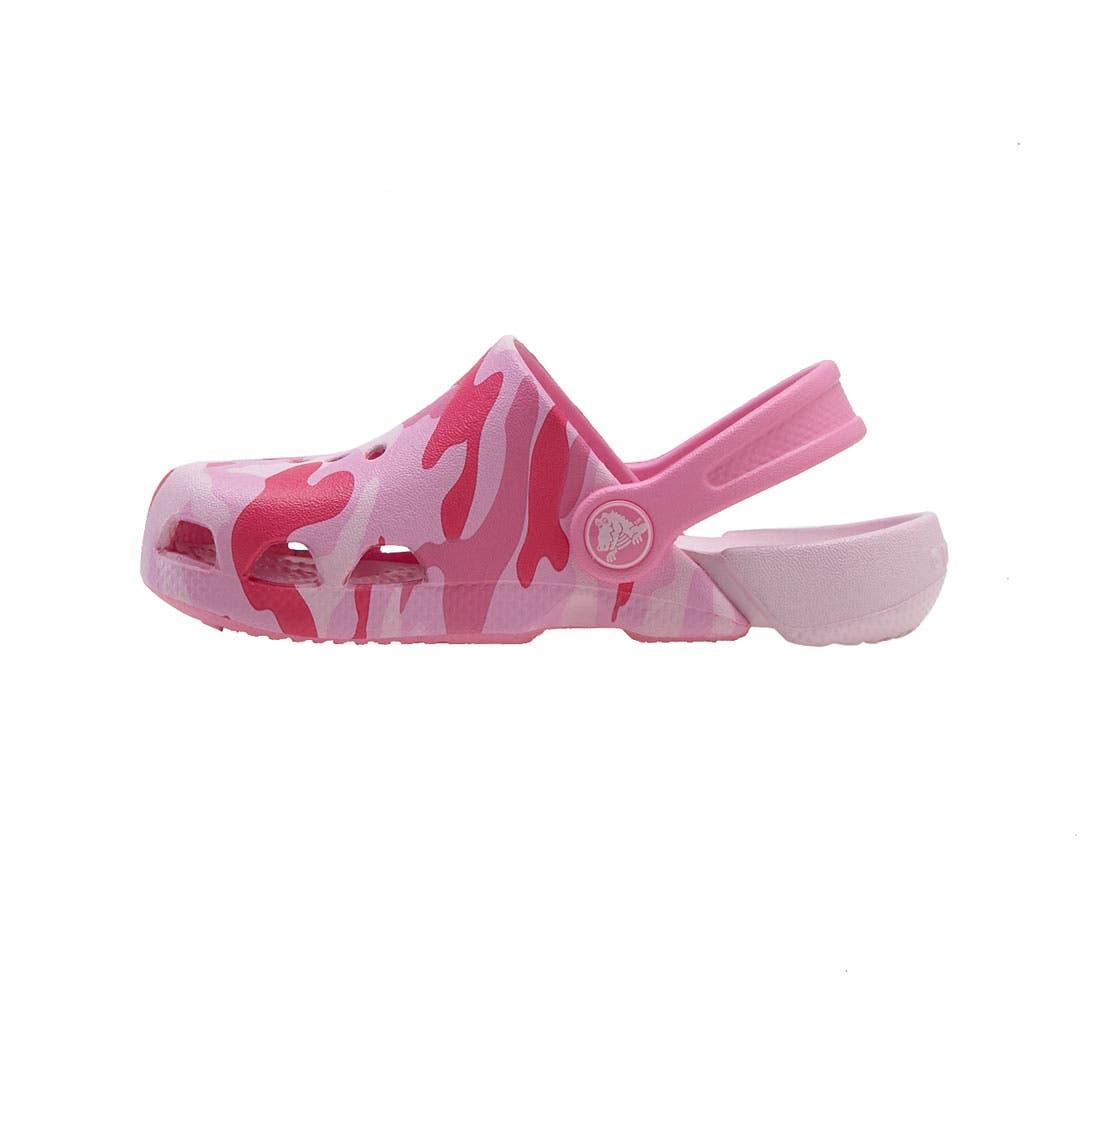 Alternate Image 2  - CROCS™ 'Electro' Sandal (Baby, Walker, Toddler & Little Kid)